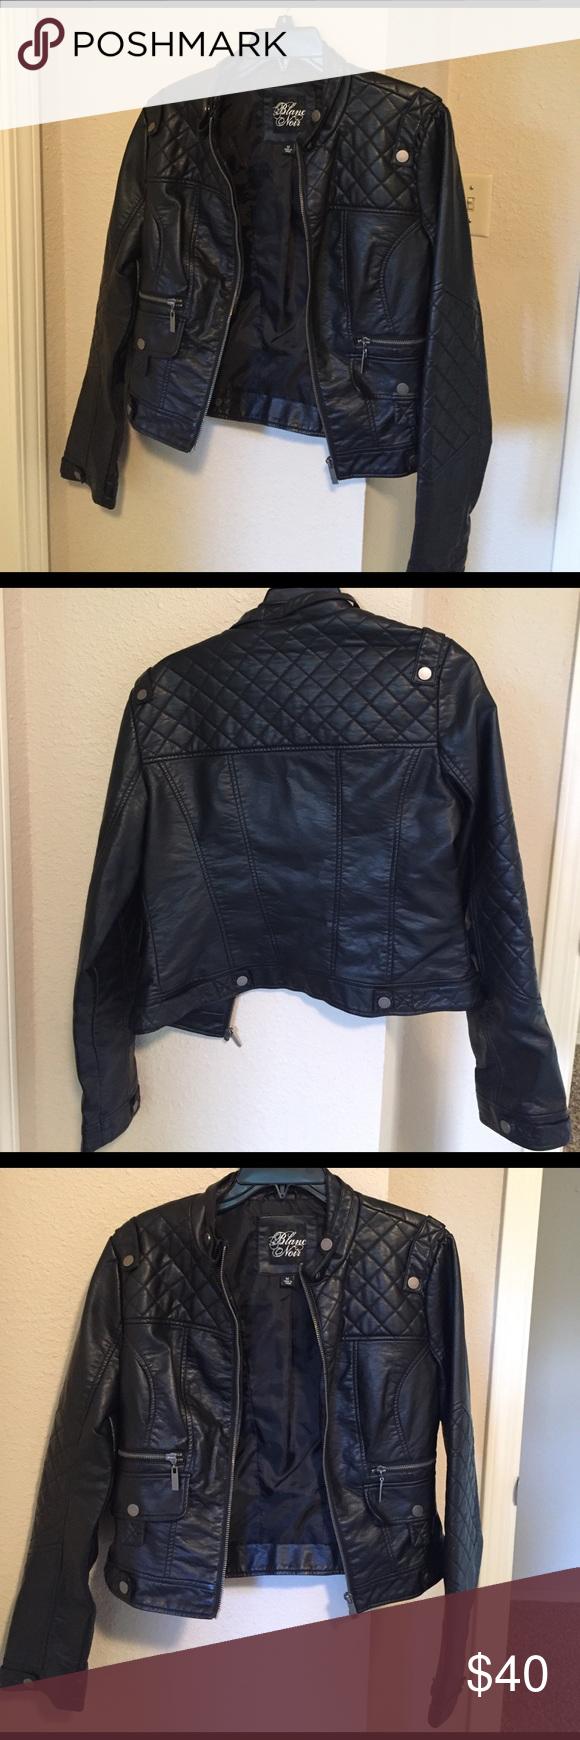 Jacket Super cute never worn faux leather crop moto jacket. Jackets & Coats